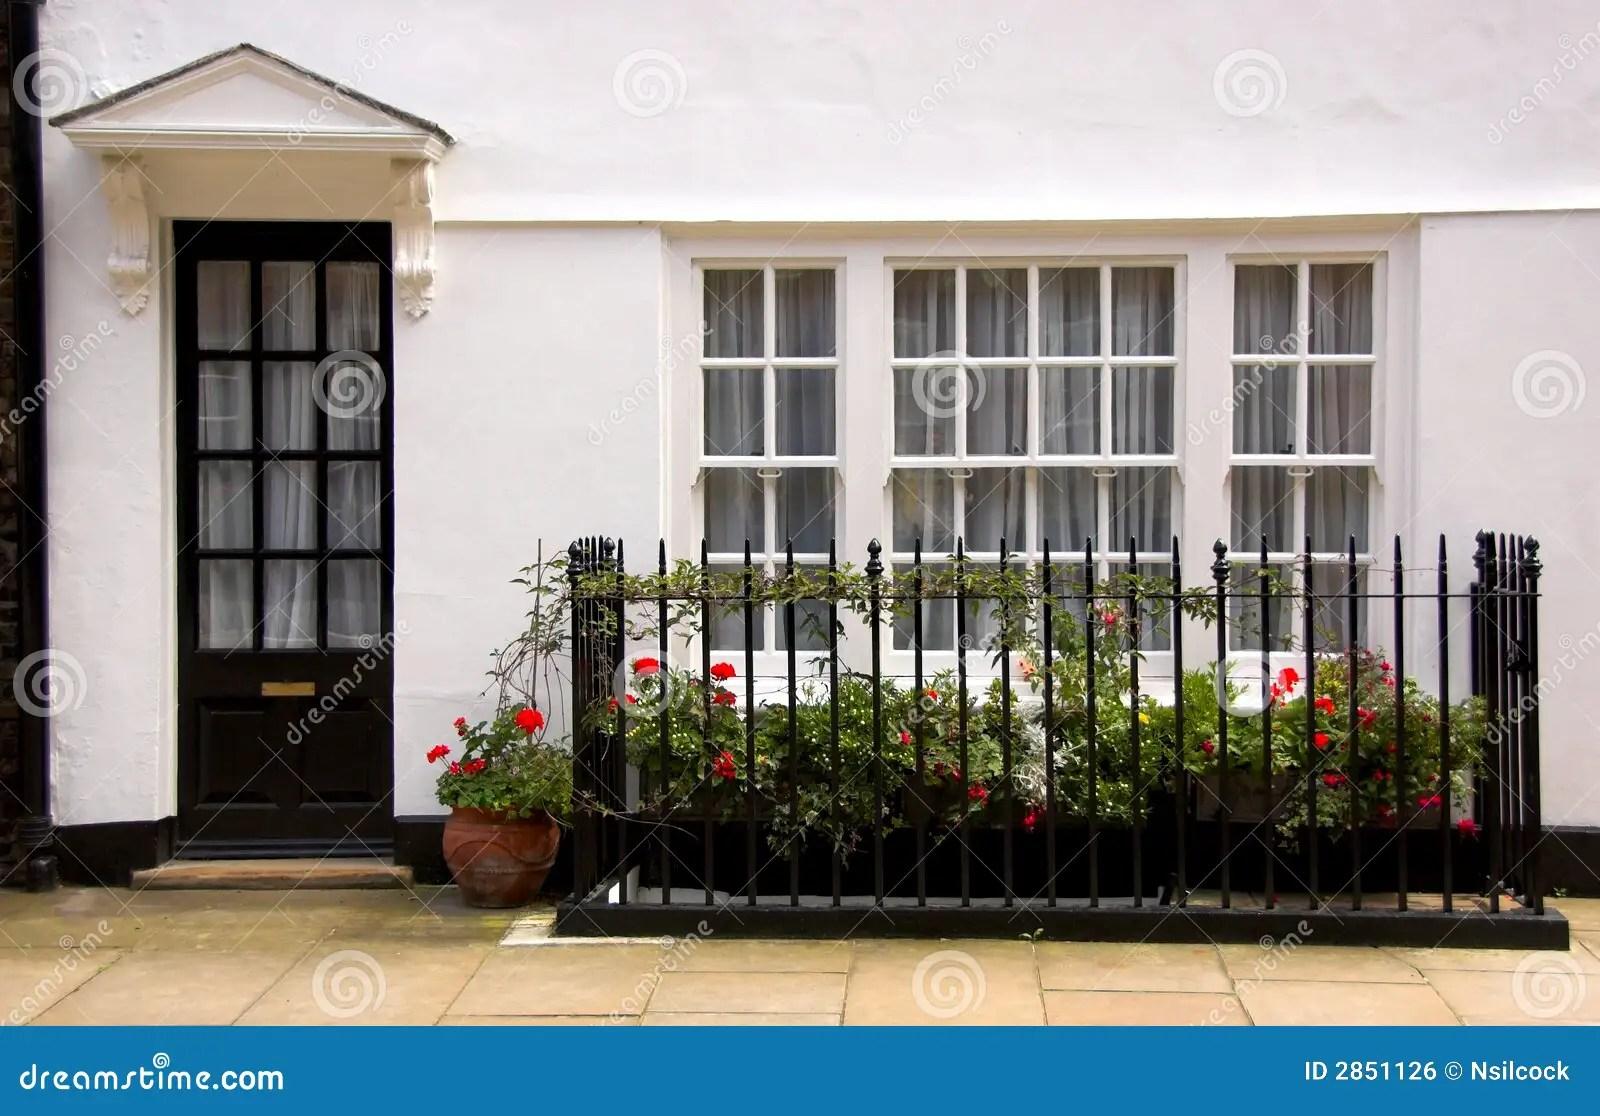 Englisches Wohnzimmer Landhauskuche Old England Country Style Edle